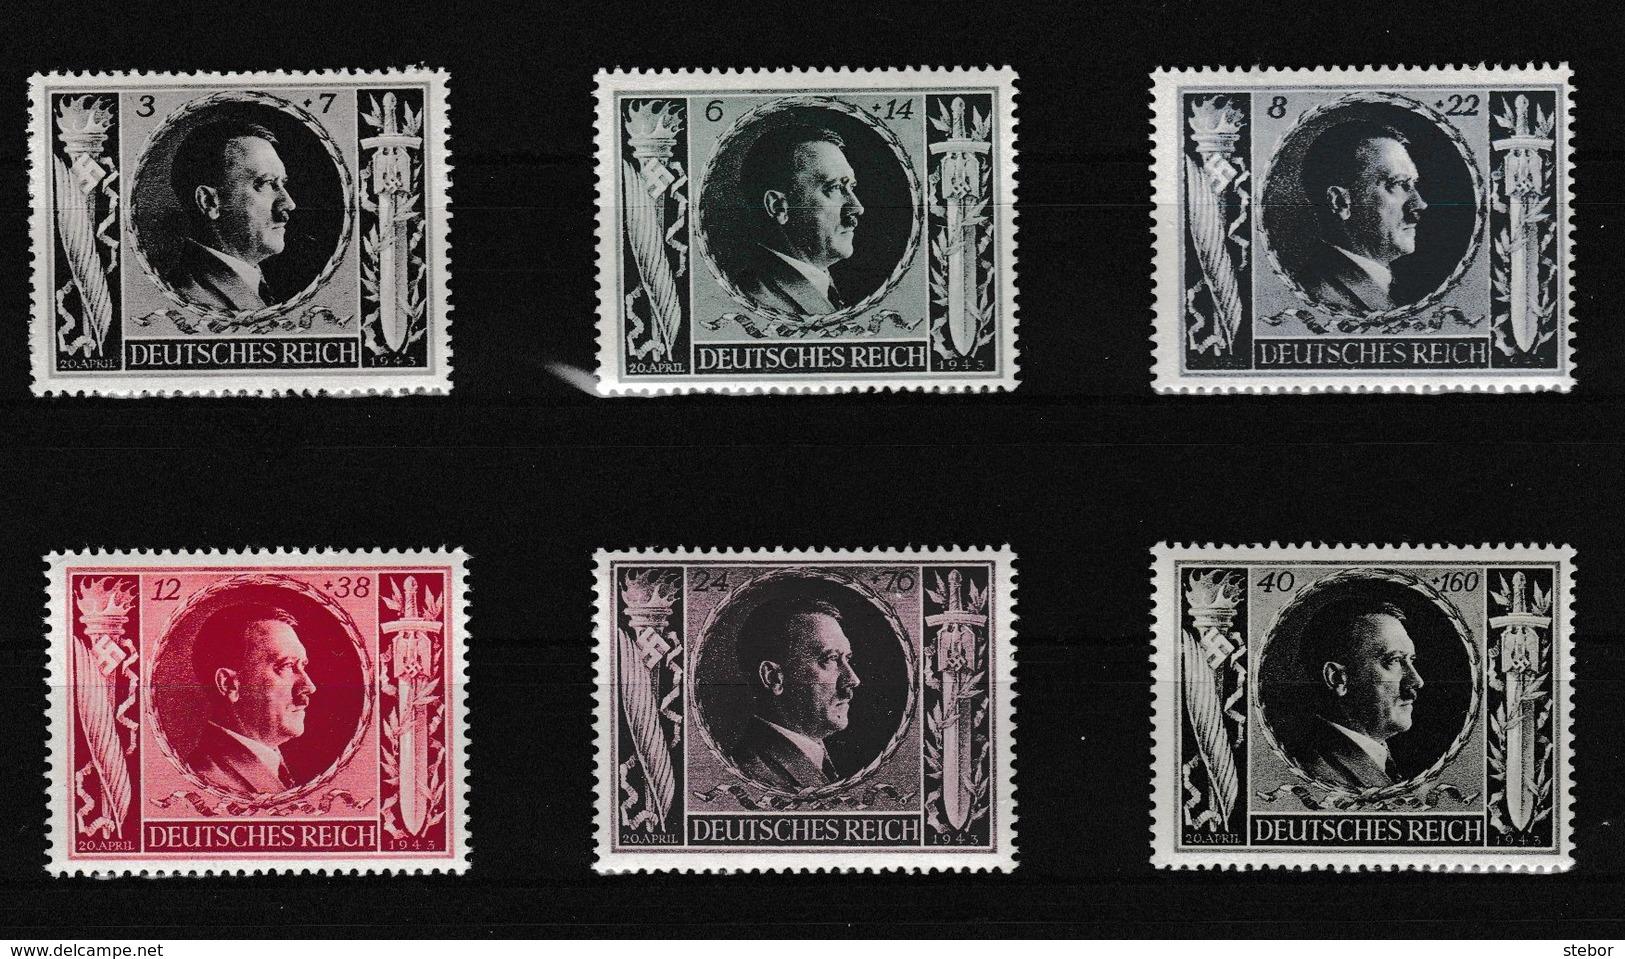 Duitse Rijk Kleine Verzameling 1943 Nr 763/68 *, Zeer Mooi Lot K973 - Timbres